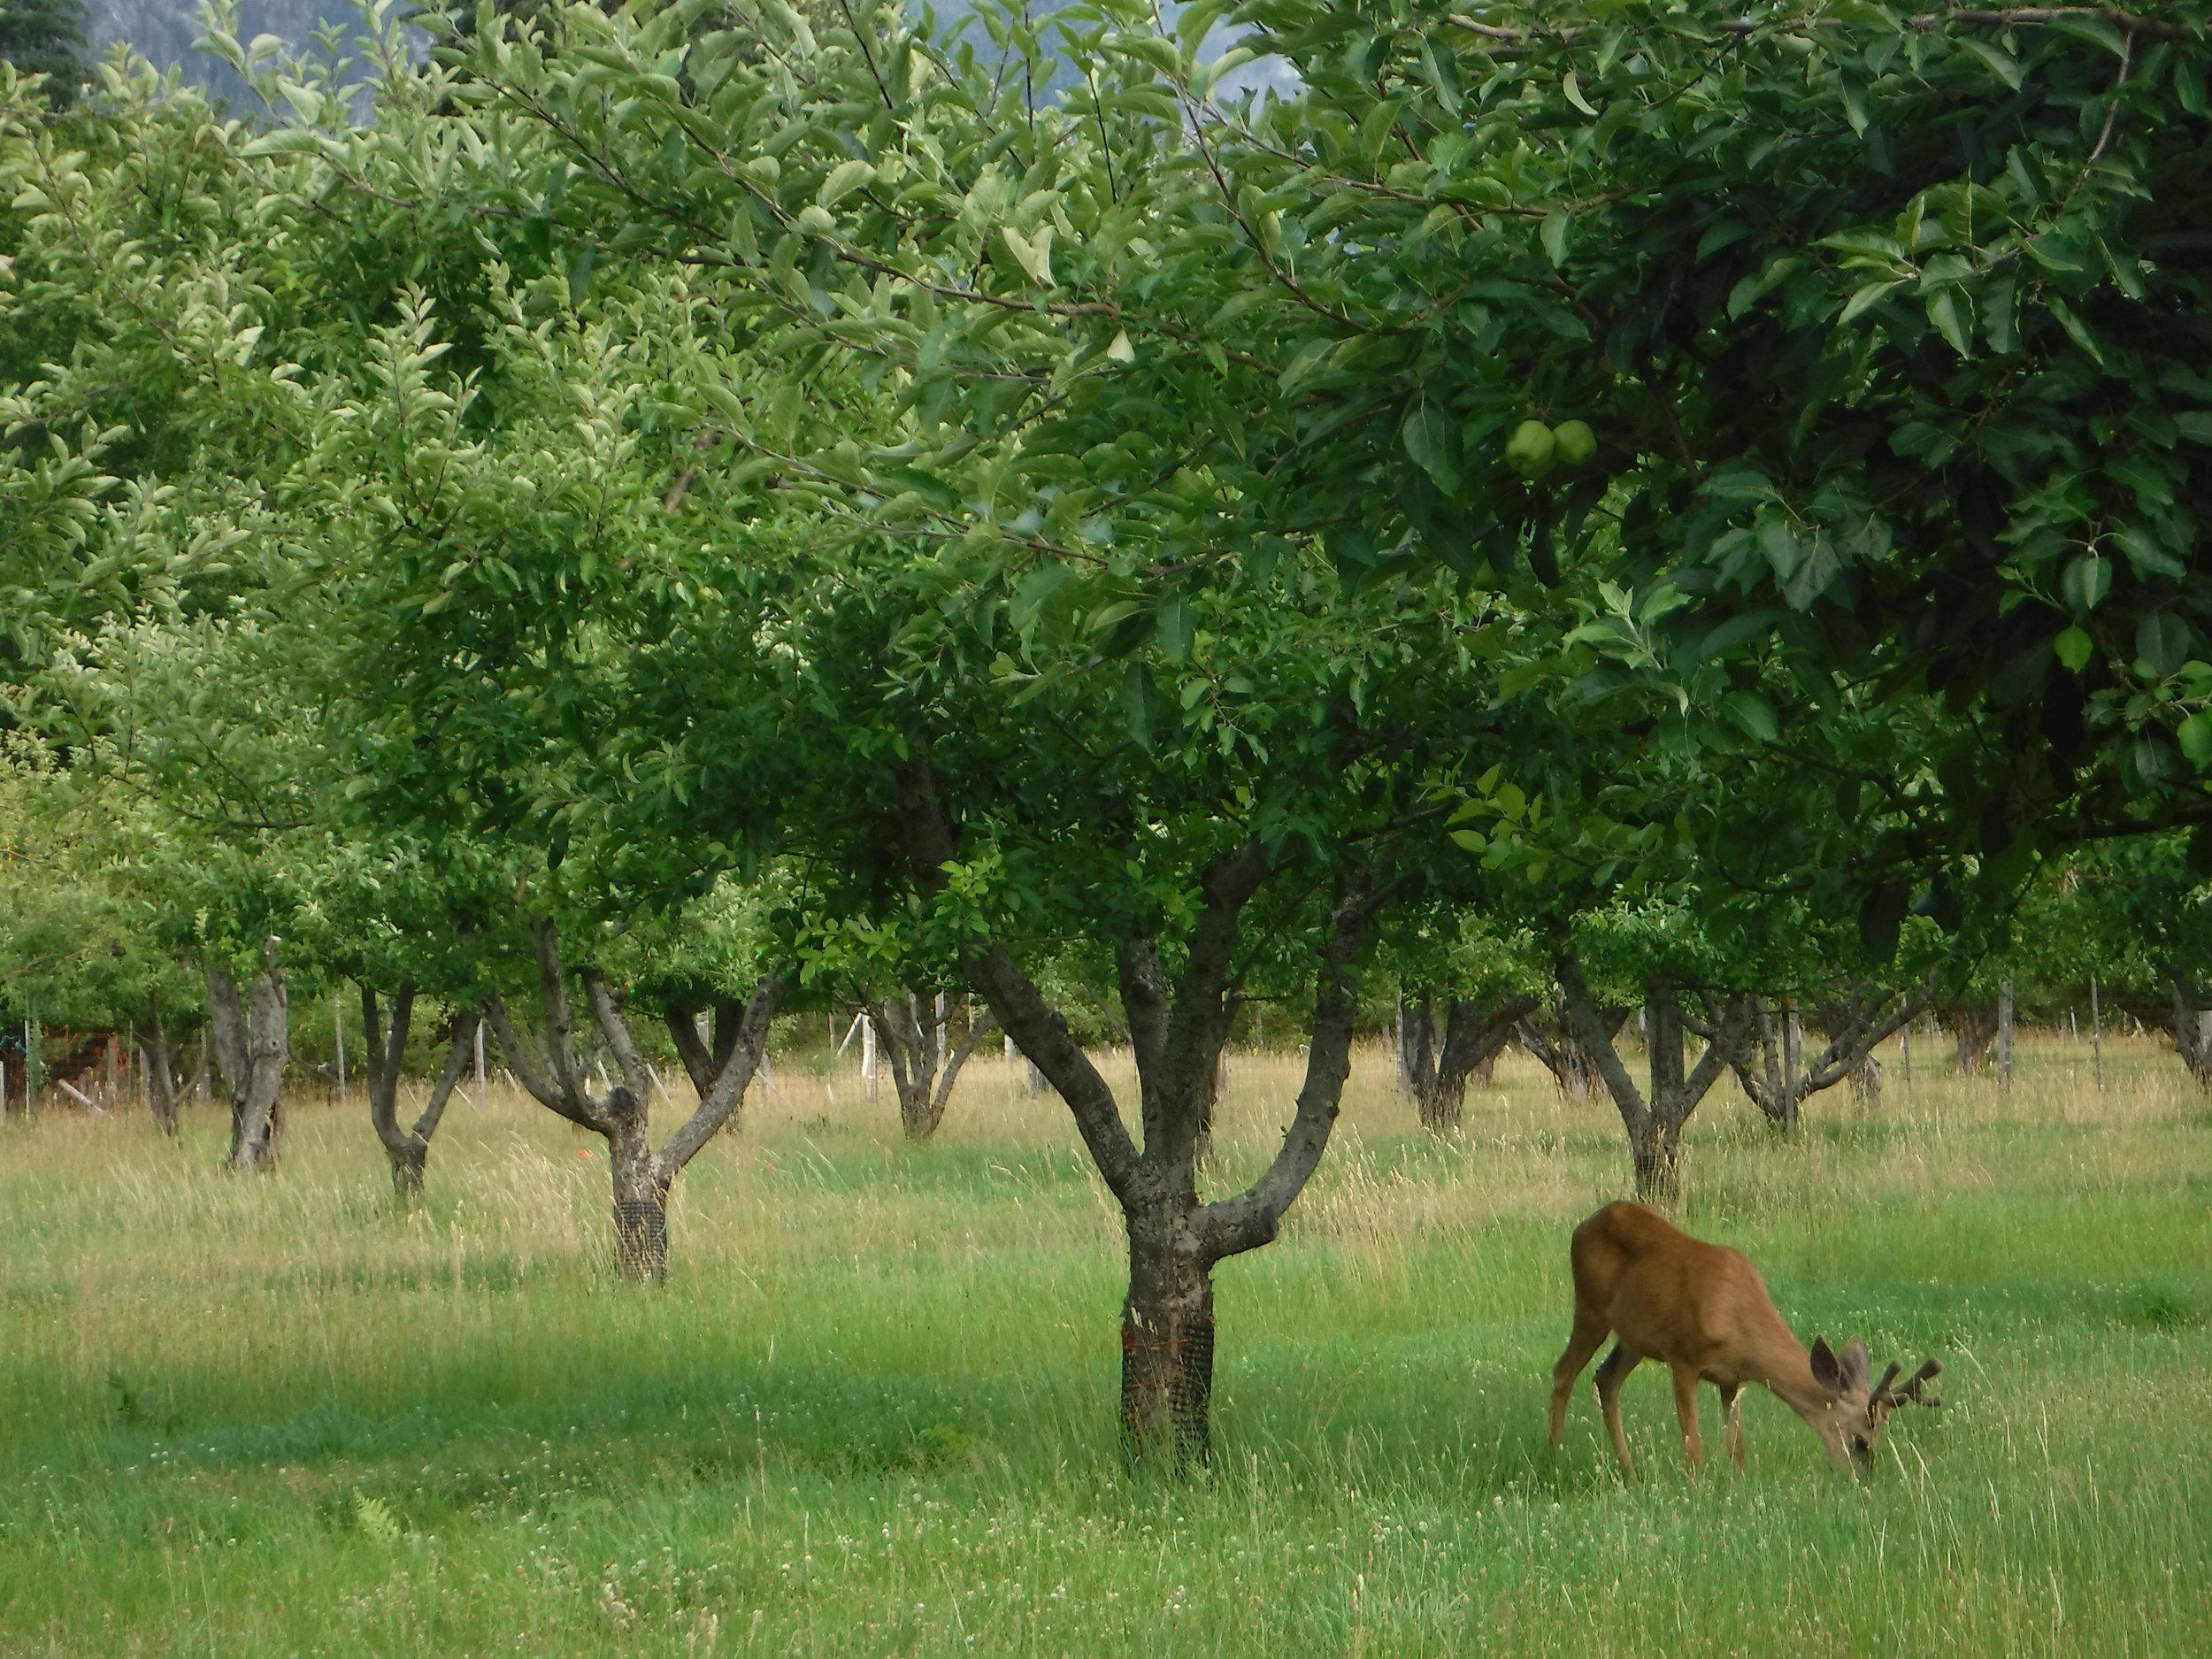 Deer in the Bucknard Orchard